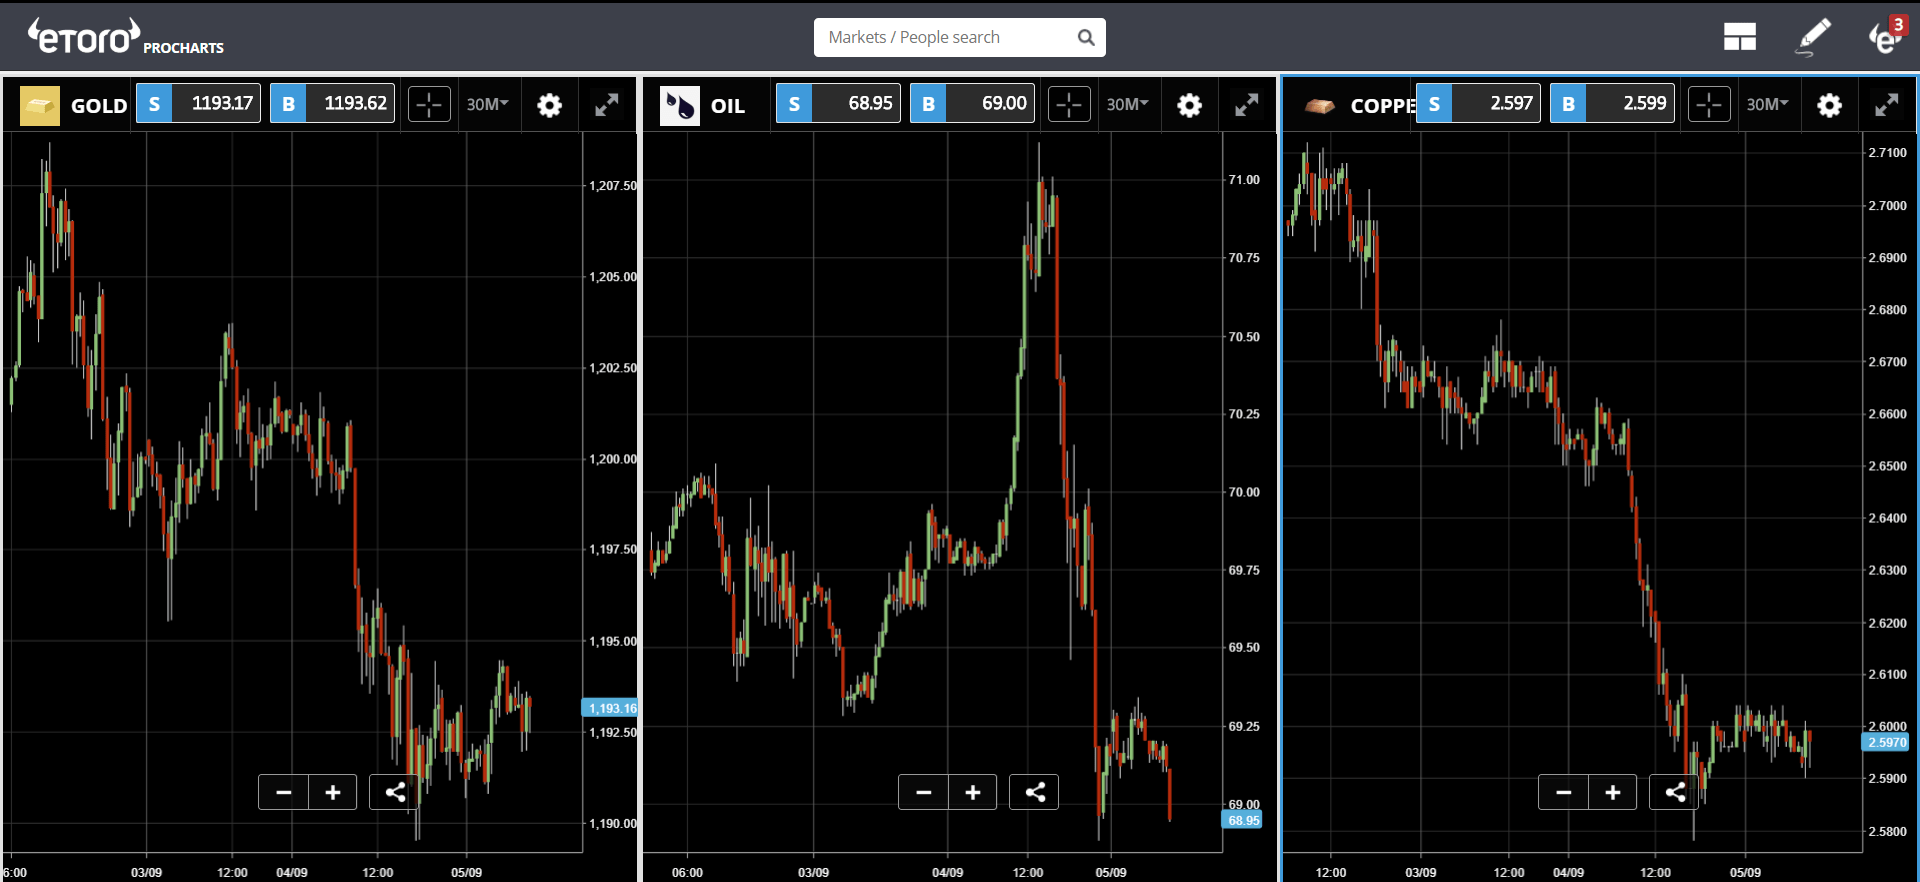 etoro, cryptocurrency, trading, markets, bitcoin, cryptos, xrp